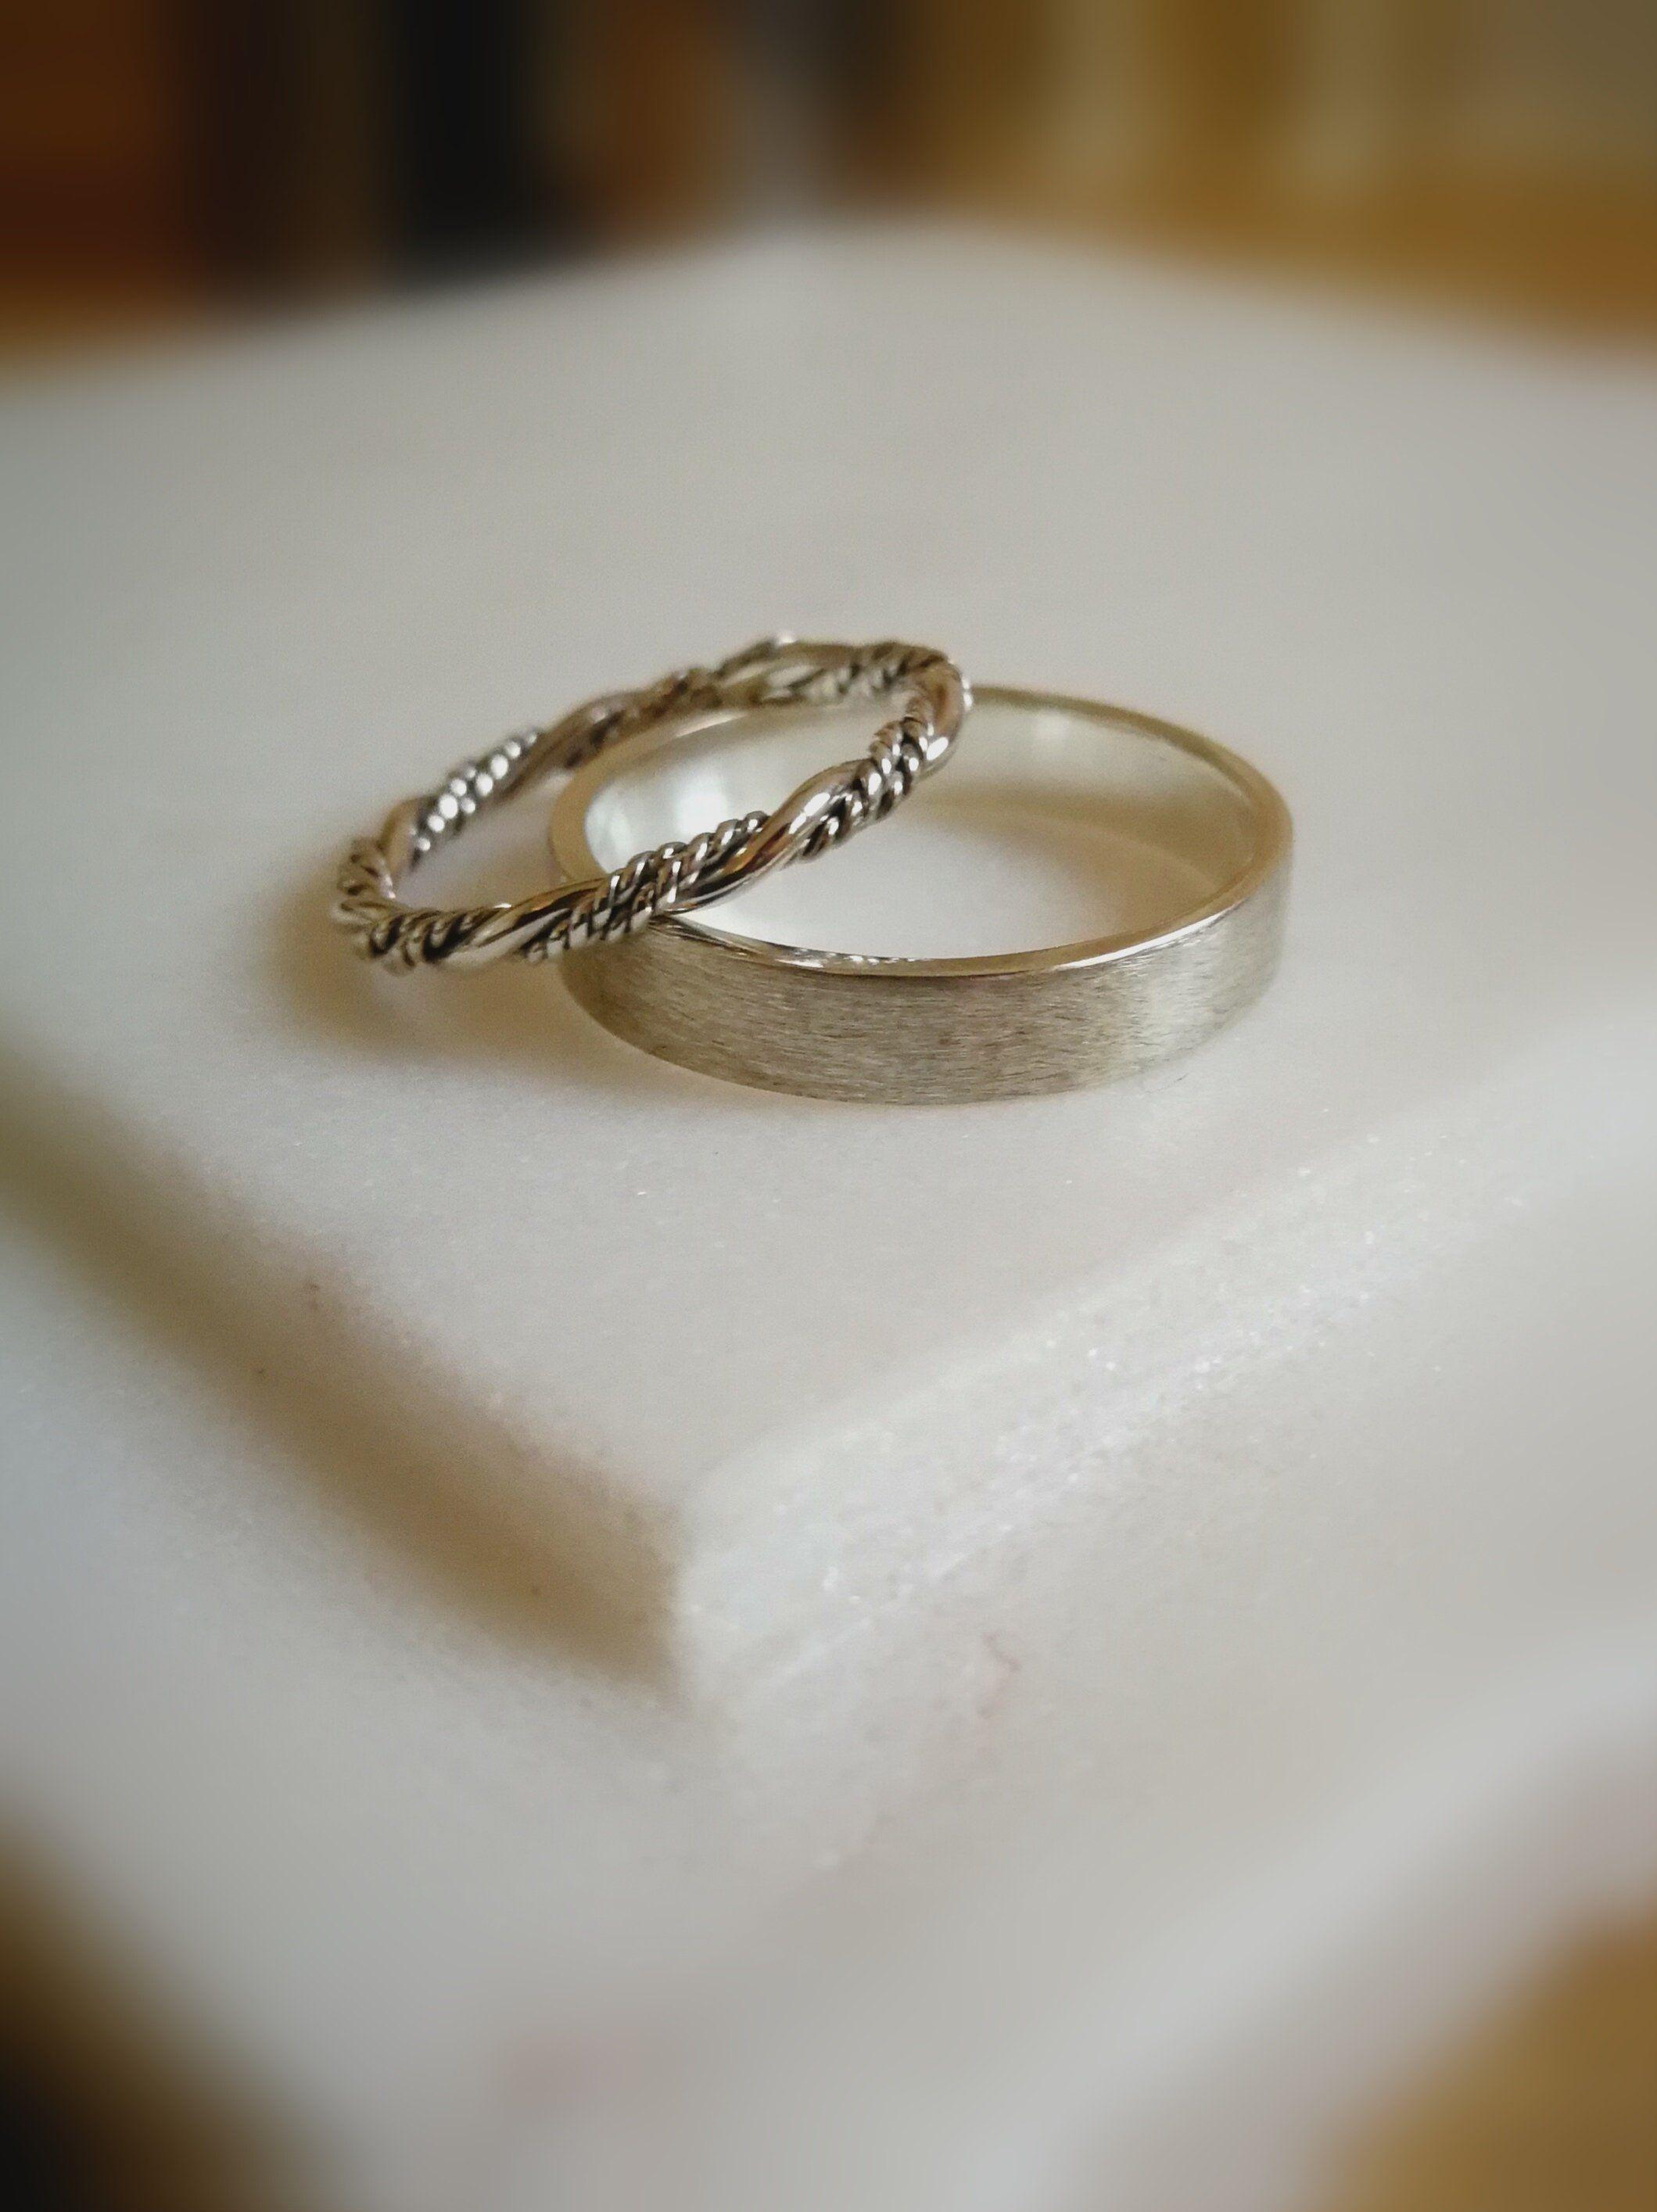 Wedding Ring Set Wedding Band Set Bridal Rings Set Viking Etsy In 2020 Wedding Rings Sets His And Hers Viking Wedding Ring Wedding Ring Sets